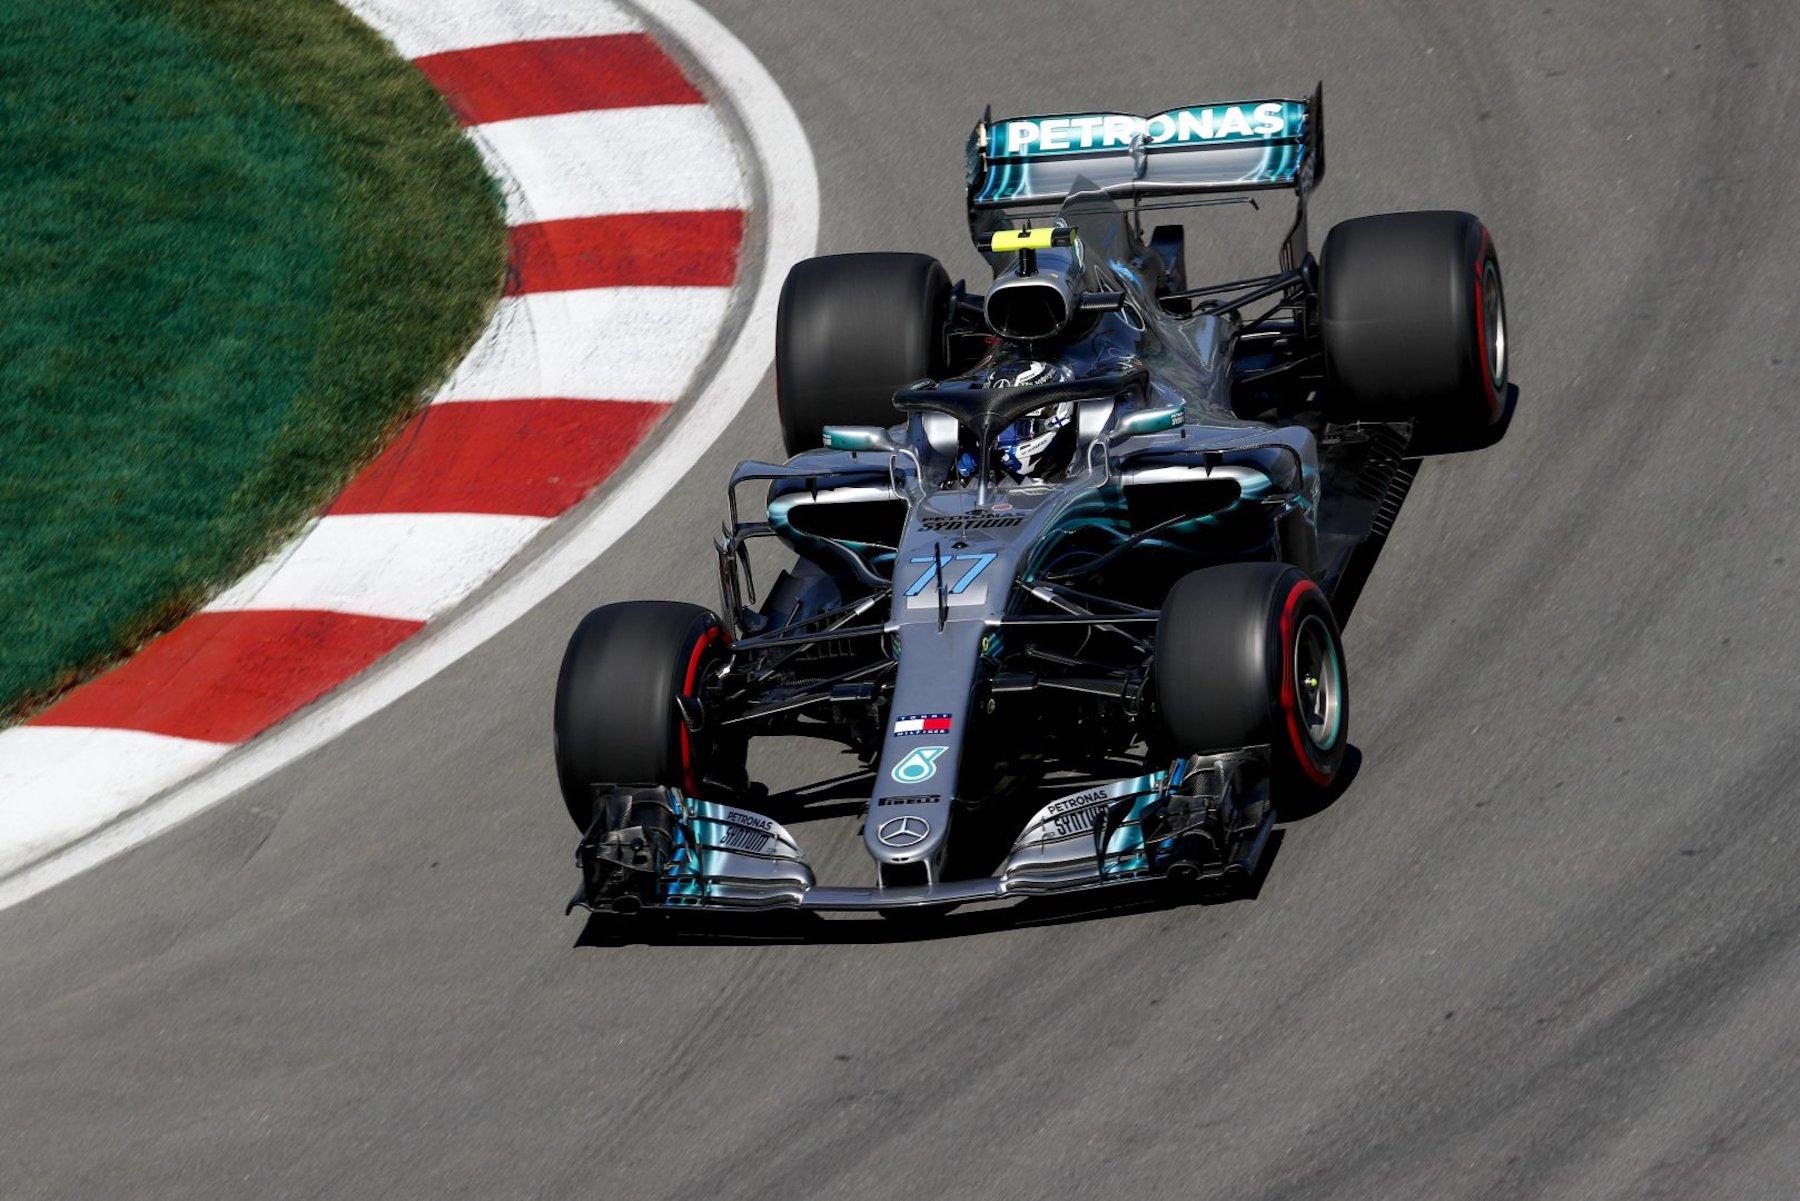 2018 Valtteri Bottas | Mercedes W09 | 2018 Japanese GP FP2 1 copy.jpg